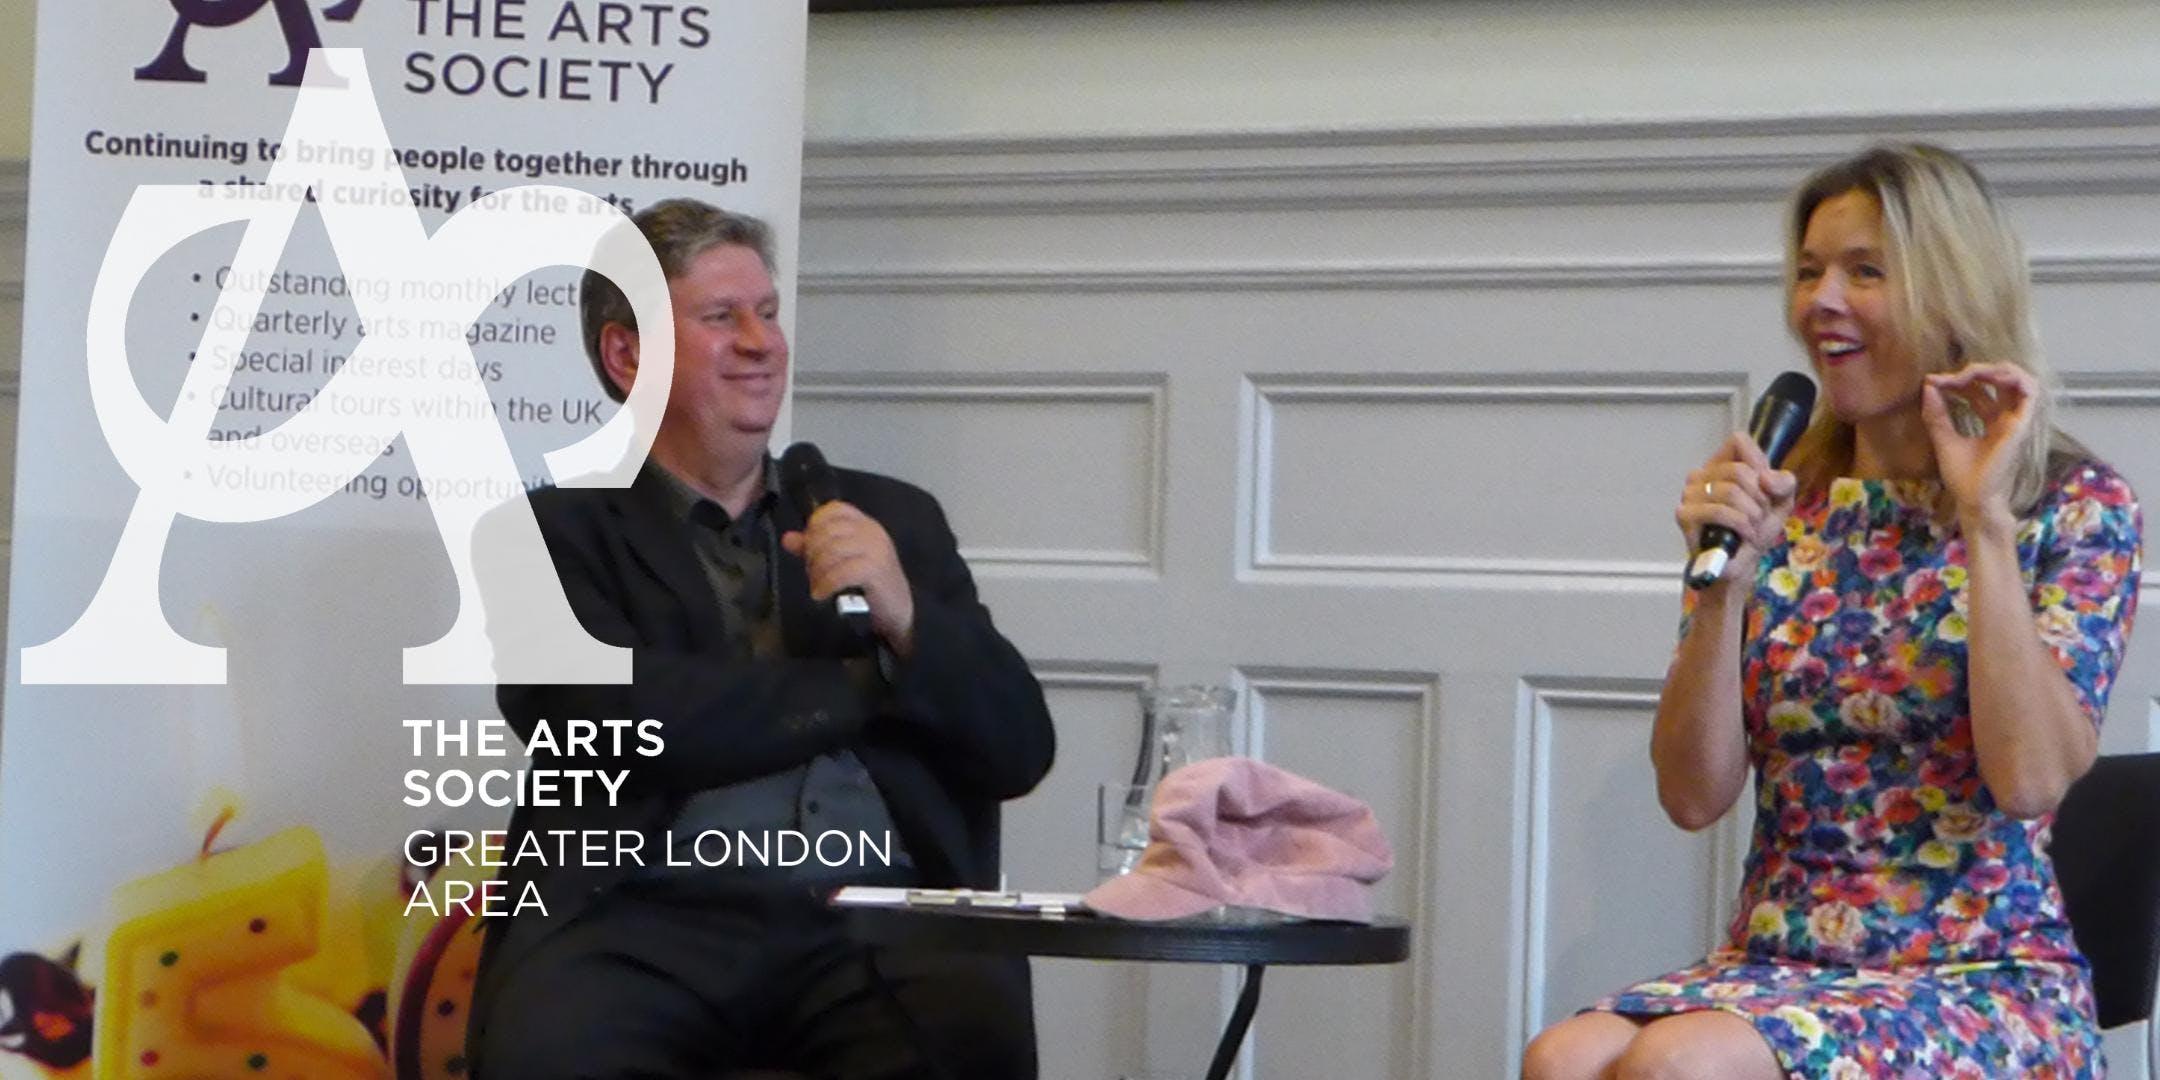 Arts on Saturday - The Arts Society Greater London Area